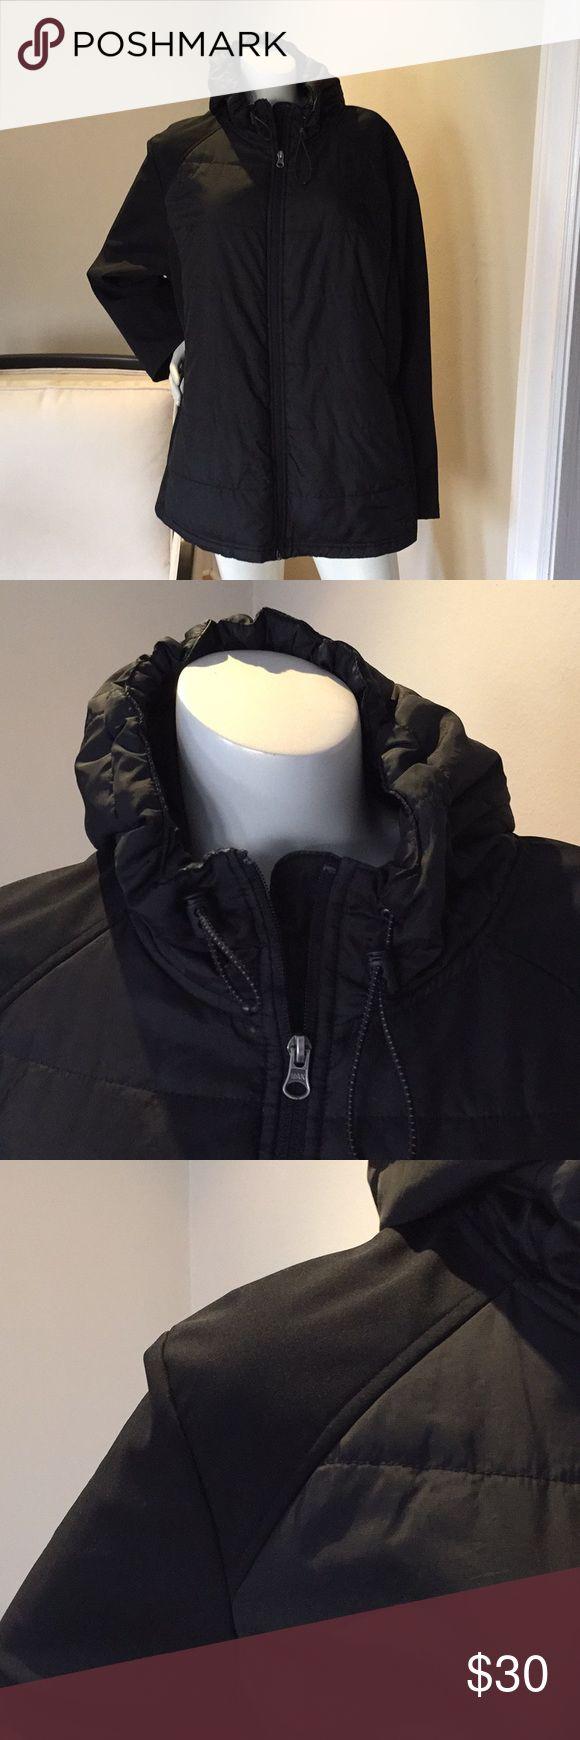 FREE TECH - Women's Black Zip Up Jacket w/ Hoodie Free Tech Free Tech Jackets & Coats Utility Jackets